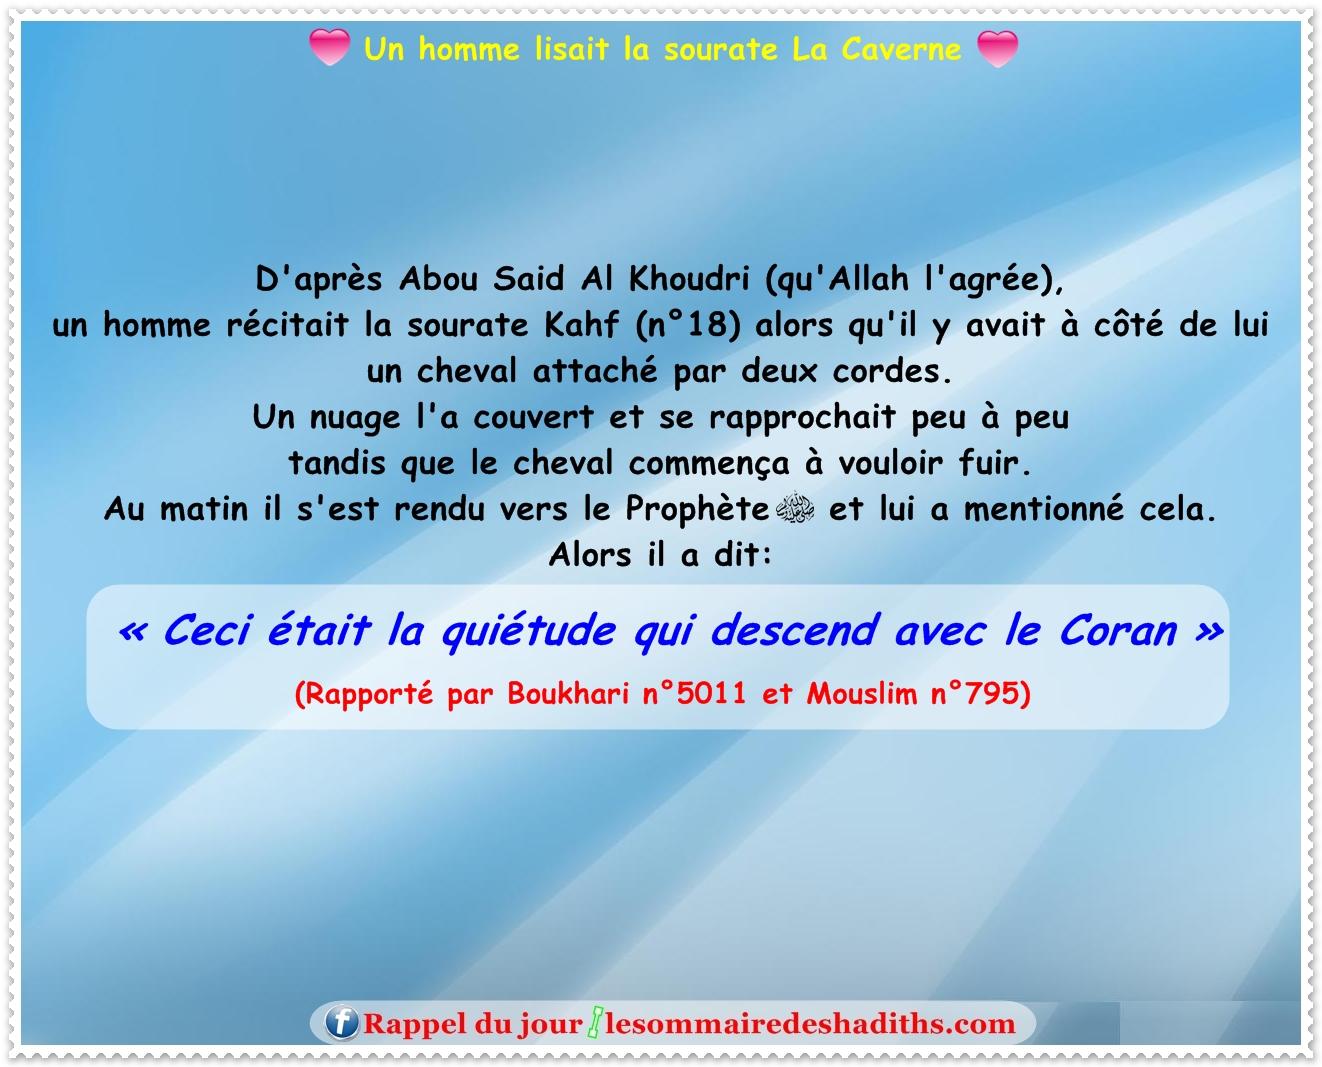 Hadith Un homme lisait la sourate La Caverne (Abu Sa'id Al-Khudri)